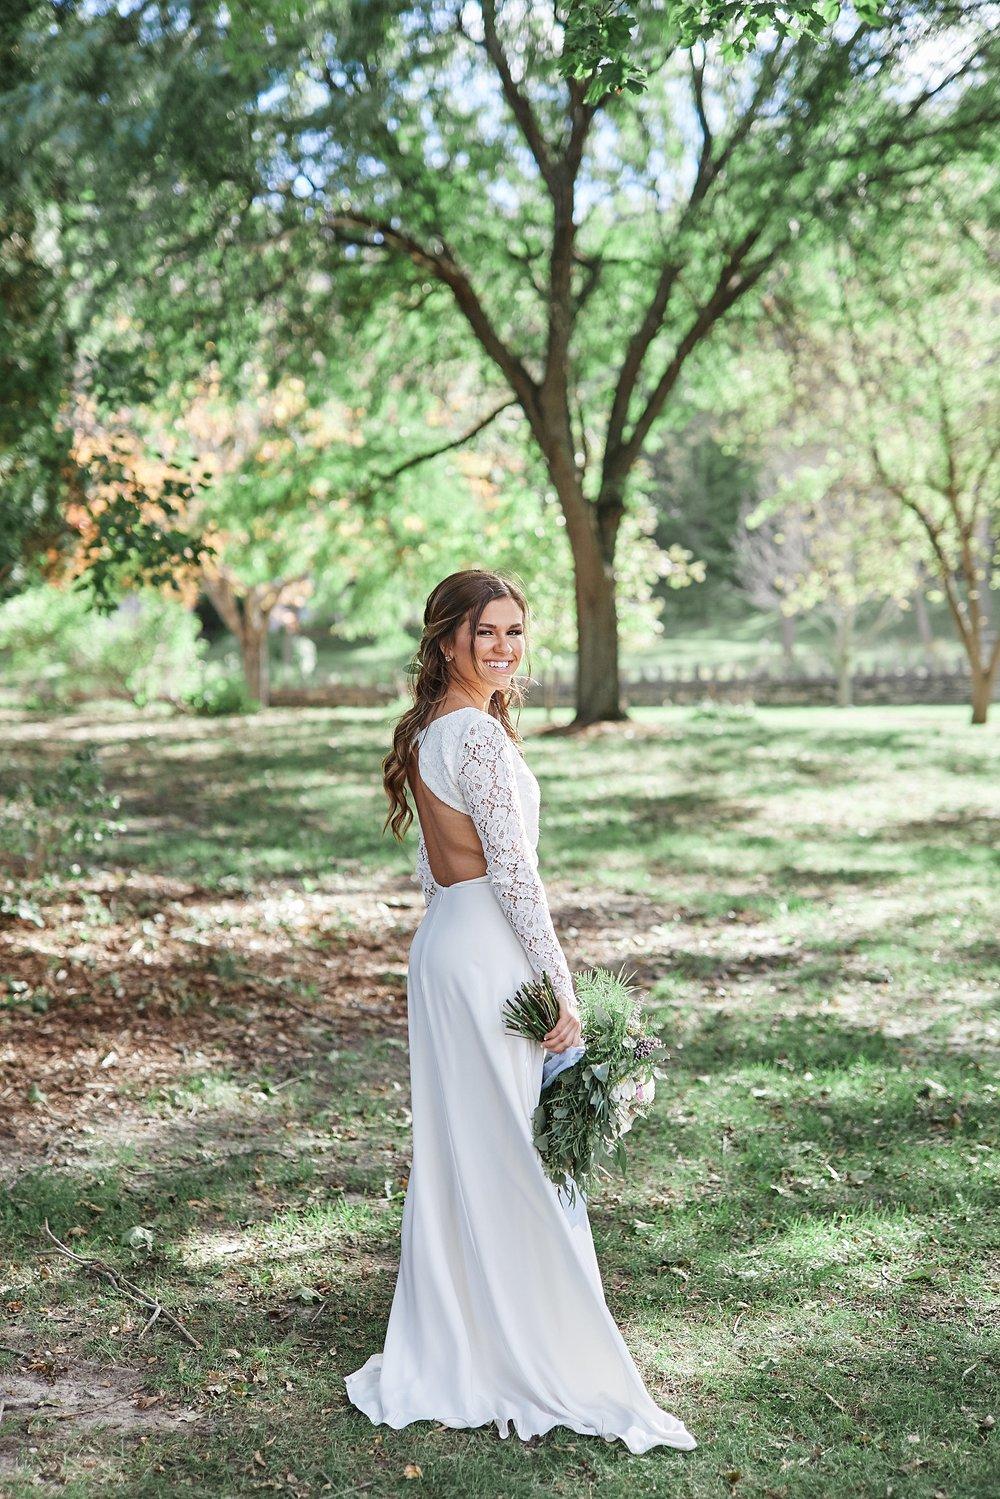 Maywood-Stone-Barn-Wedding-Rochester-Minnesota-Perry-James-Photo_0620.jpg